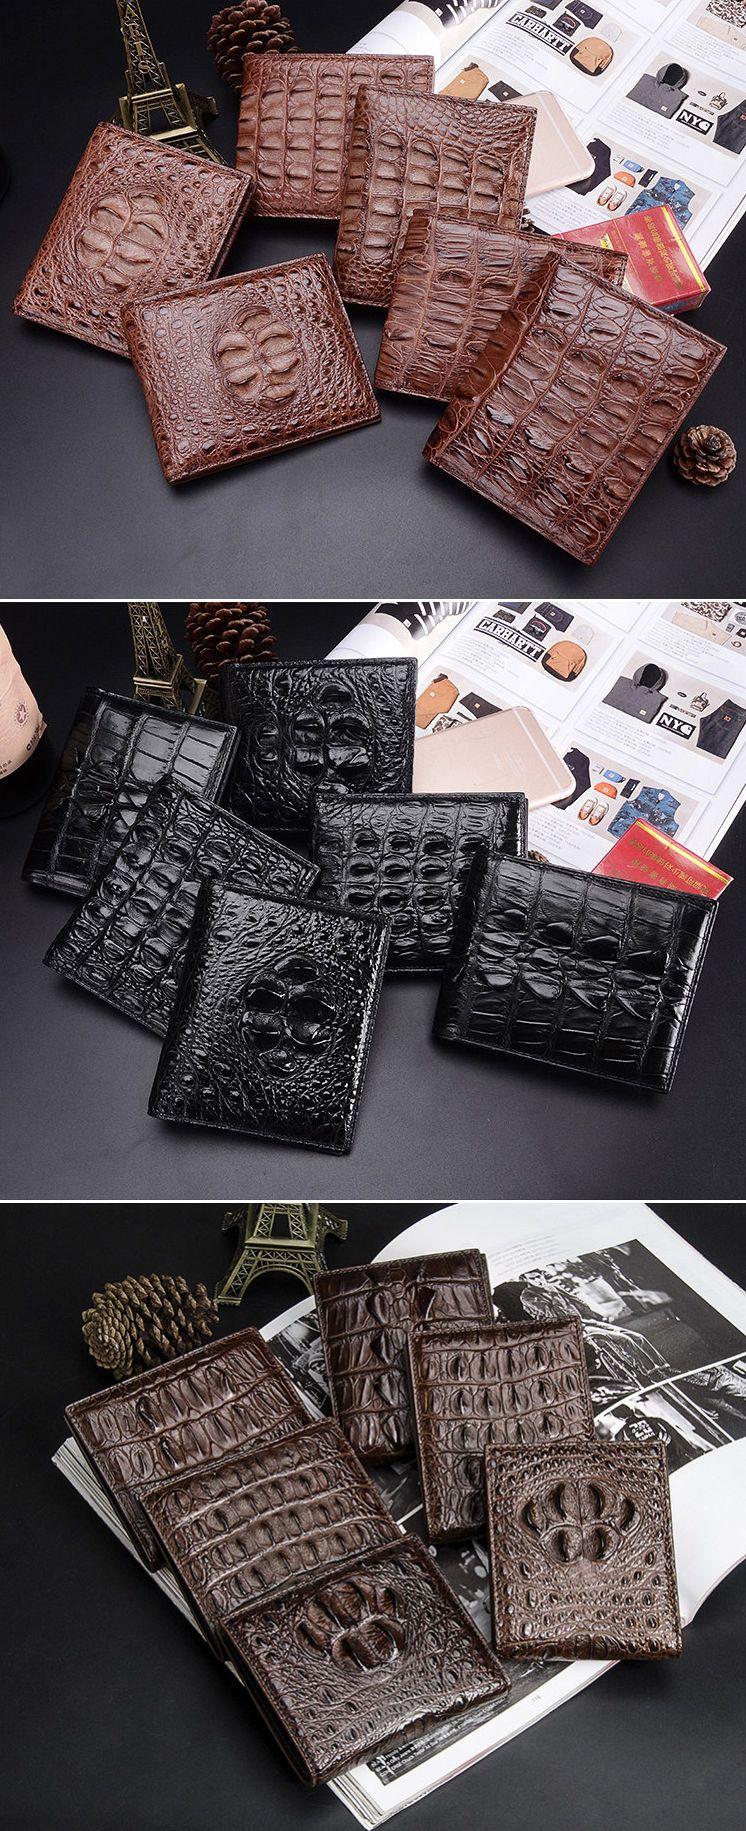 bac788da188d Mens Crocodile Wallet, Mens Alligator Wallet | Crocodile Wallets and ...